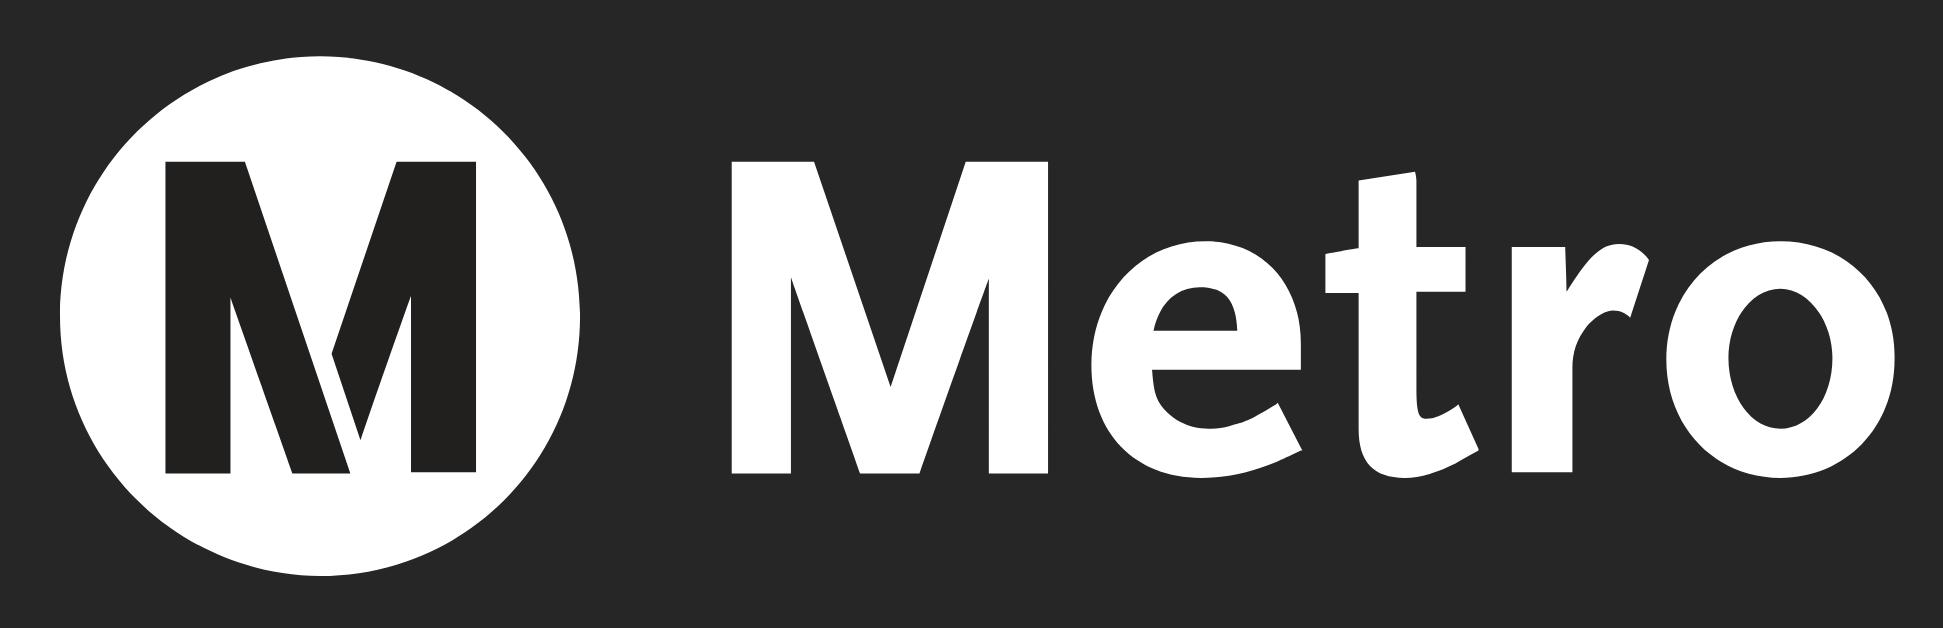 Breathe LA - Logo - Los Angeles County Metropolitan Transportation Authority (LA Metro)